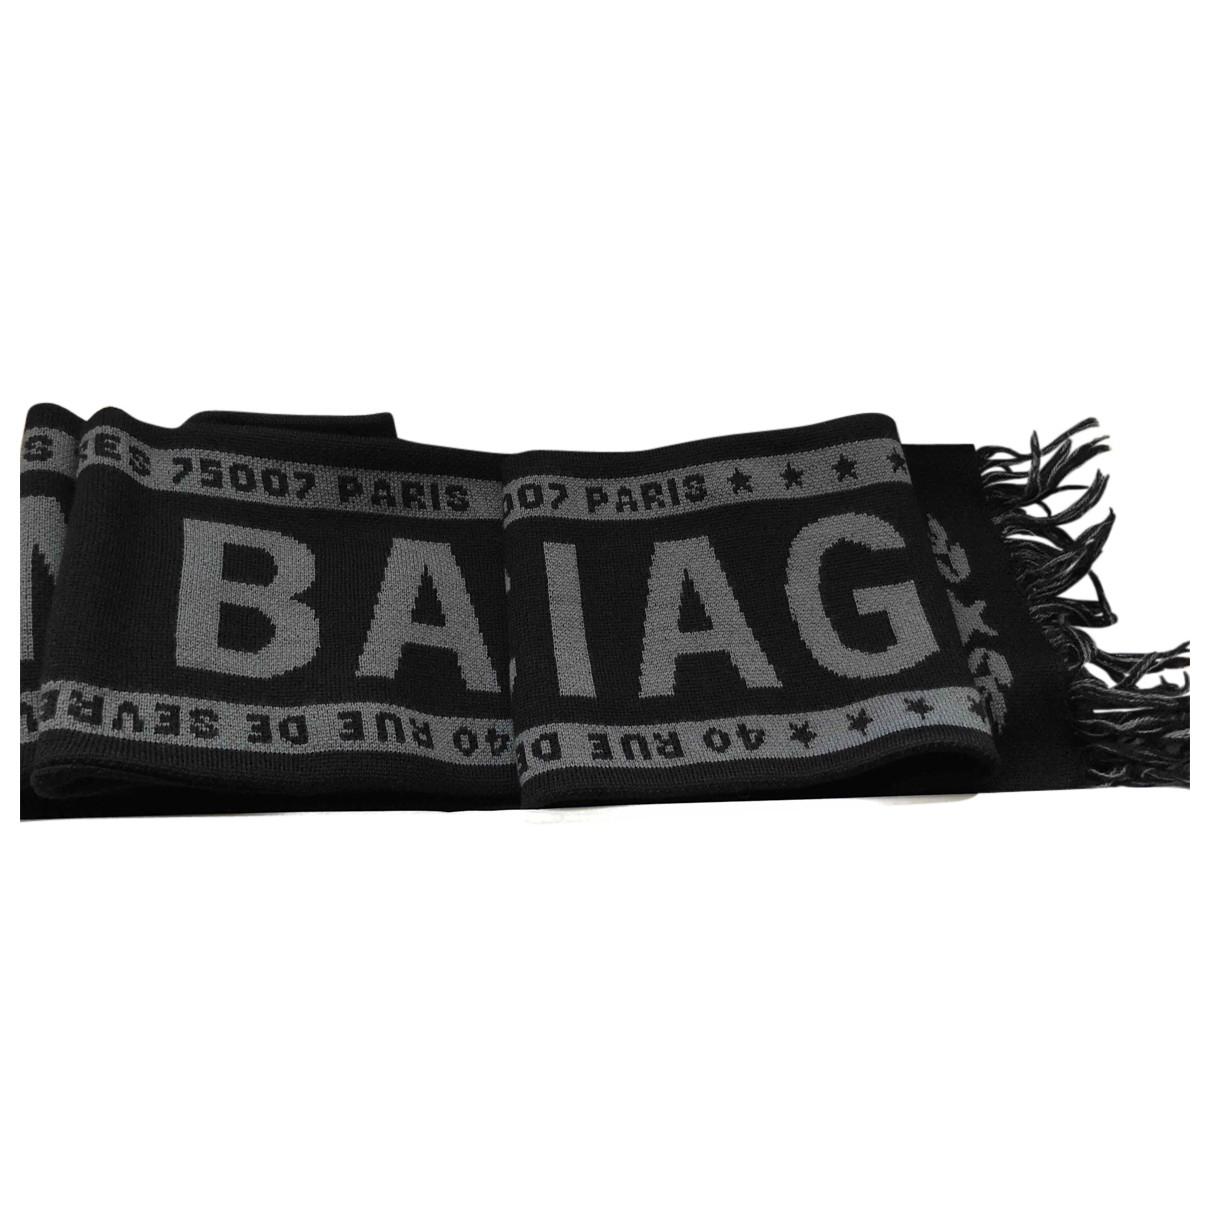 Balenciaga - Cheches.Echarpes   pour homme en laine - noir